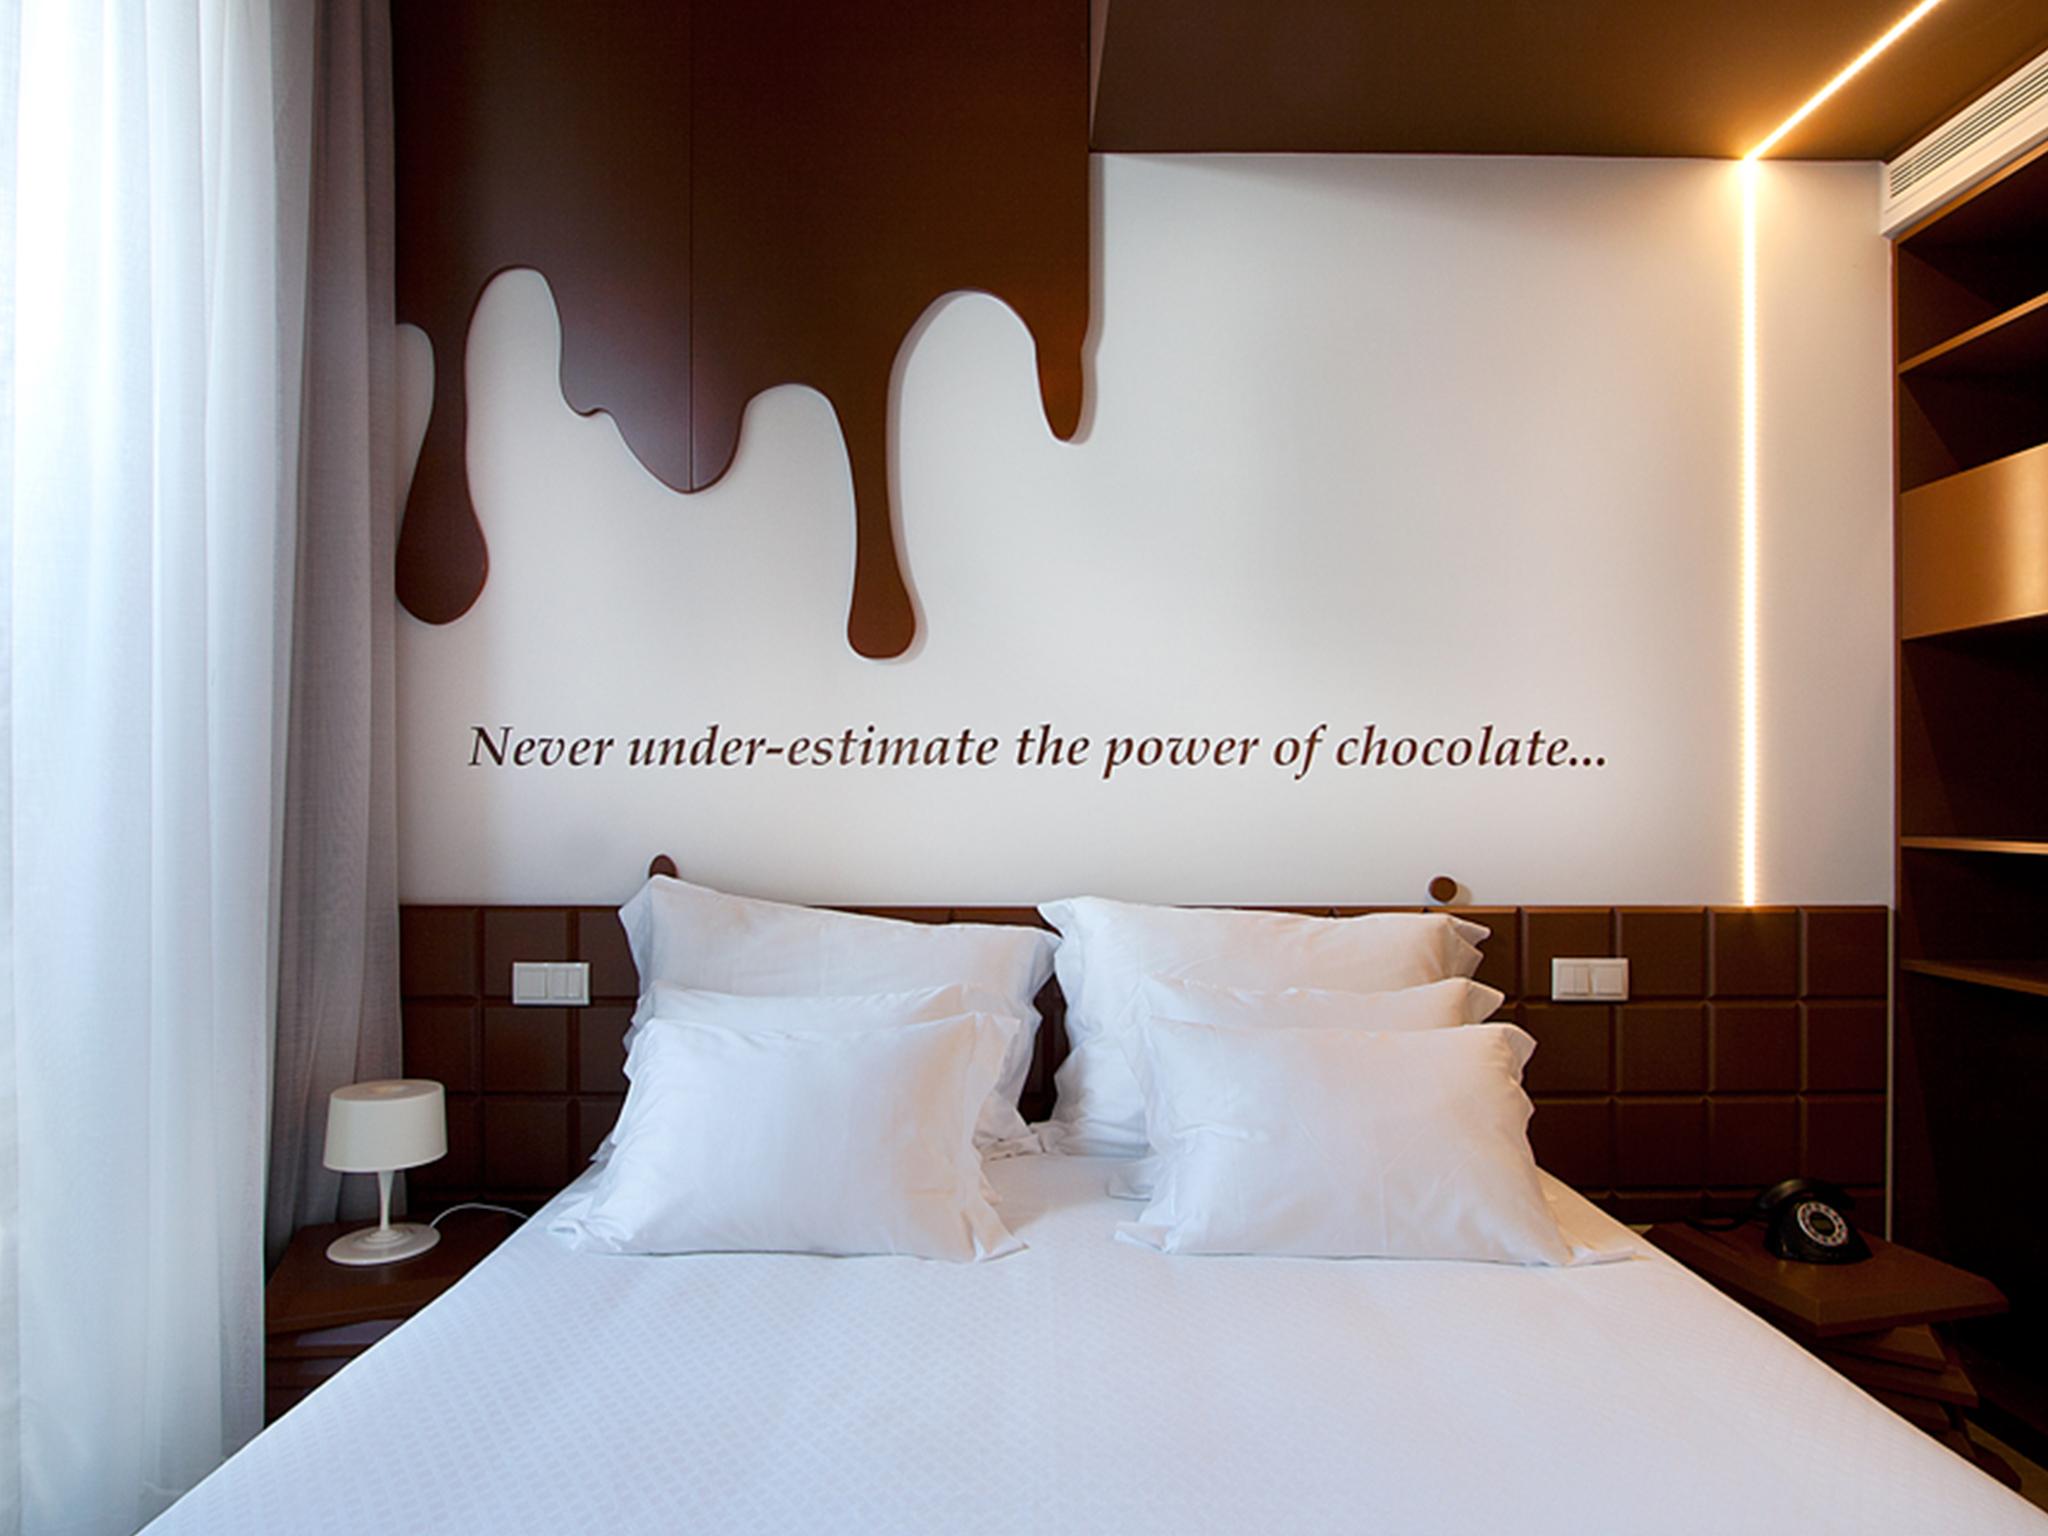 Hotel Fábrica do Chocolate